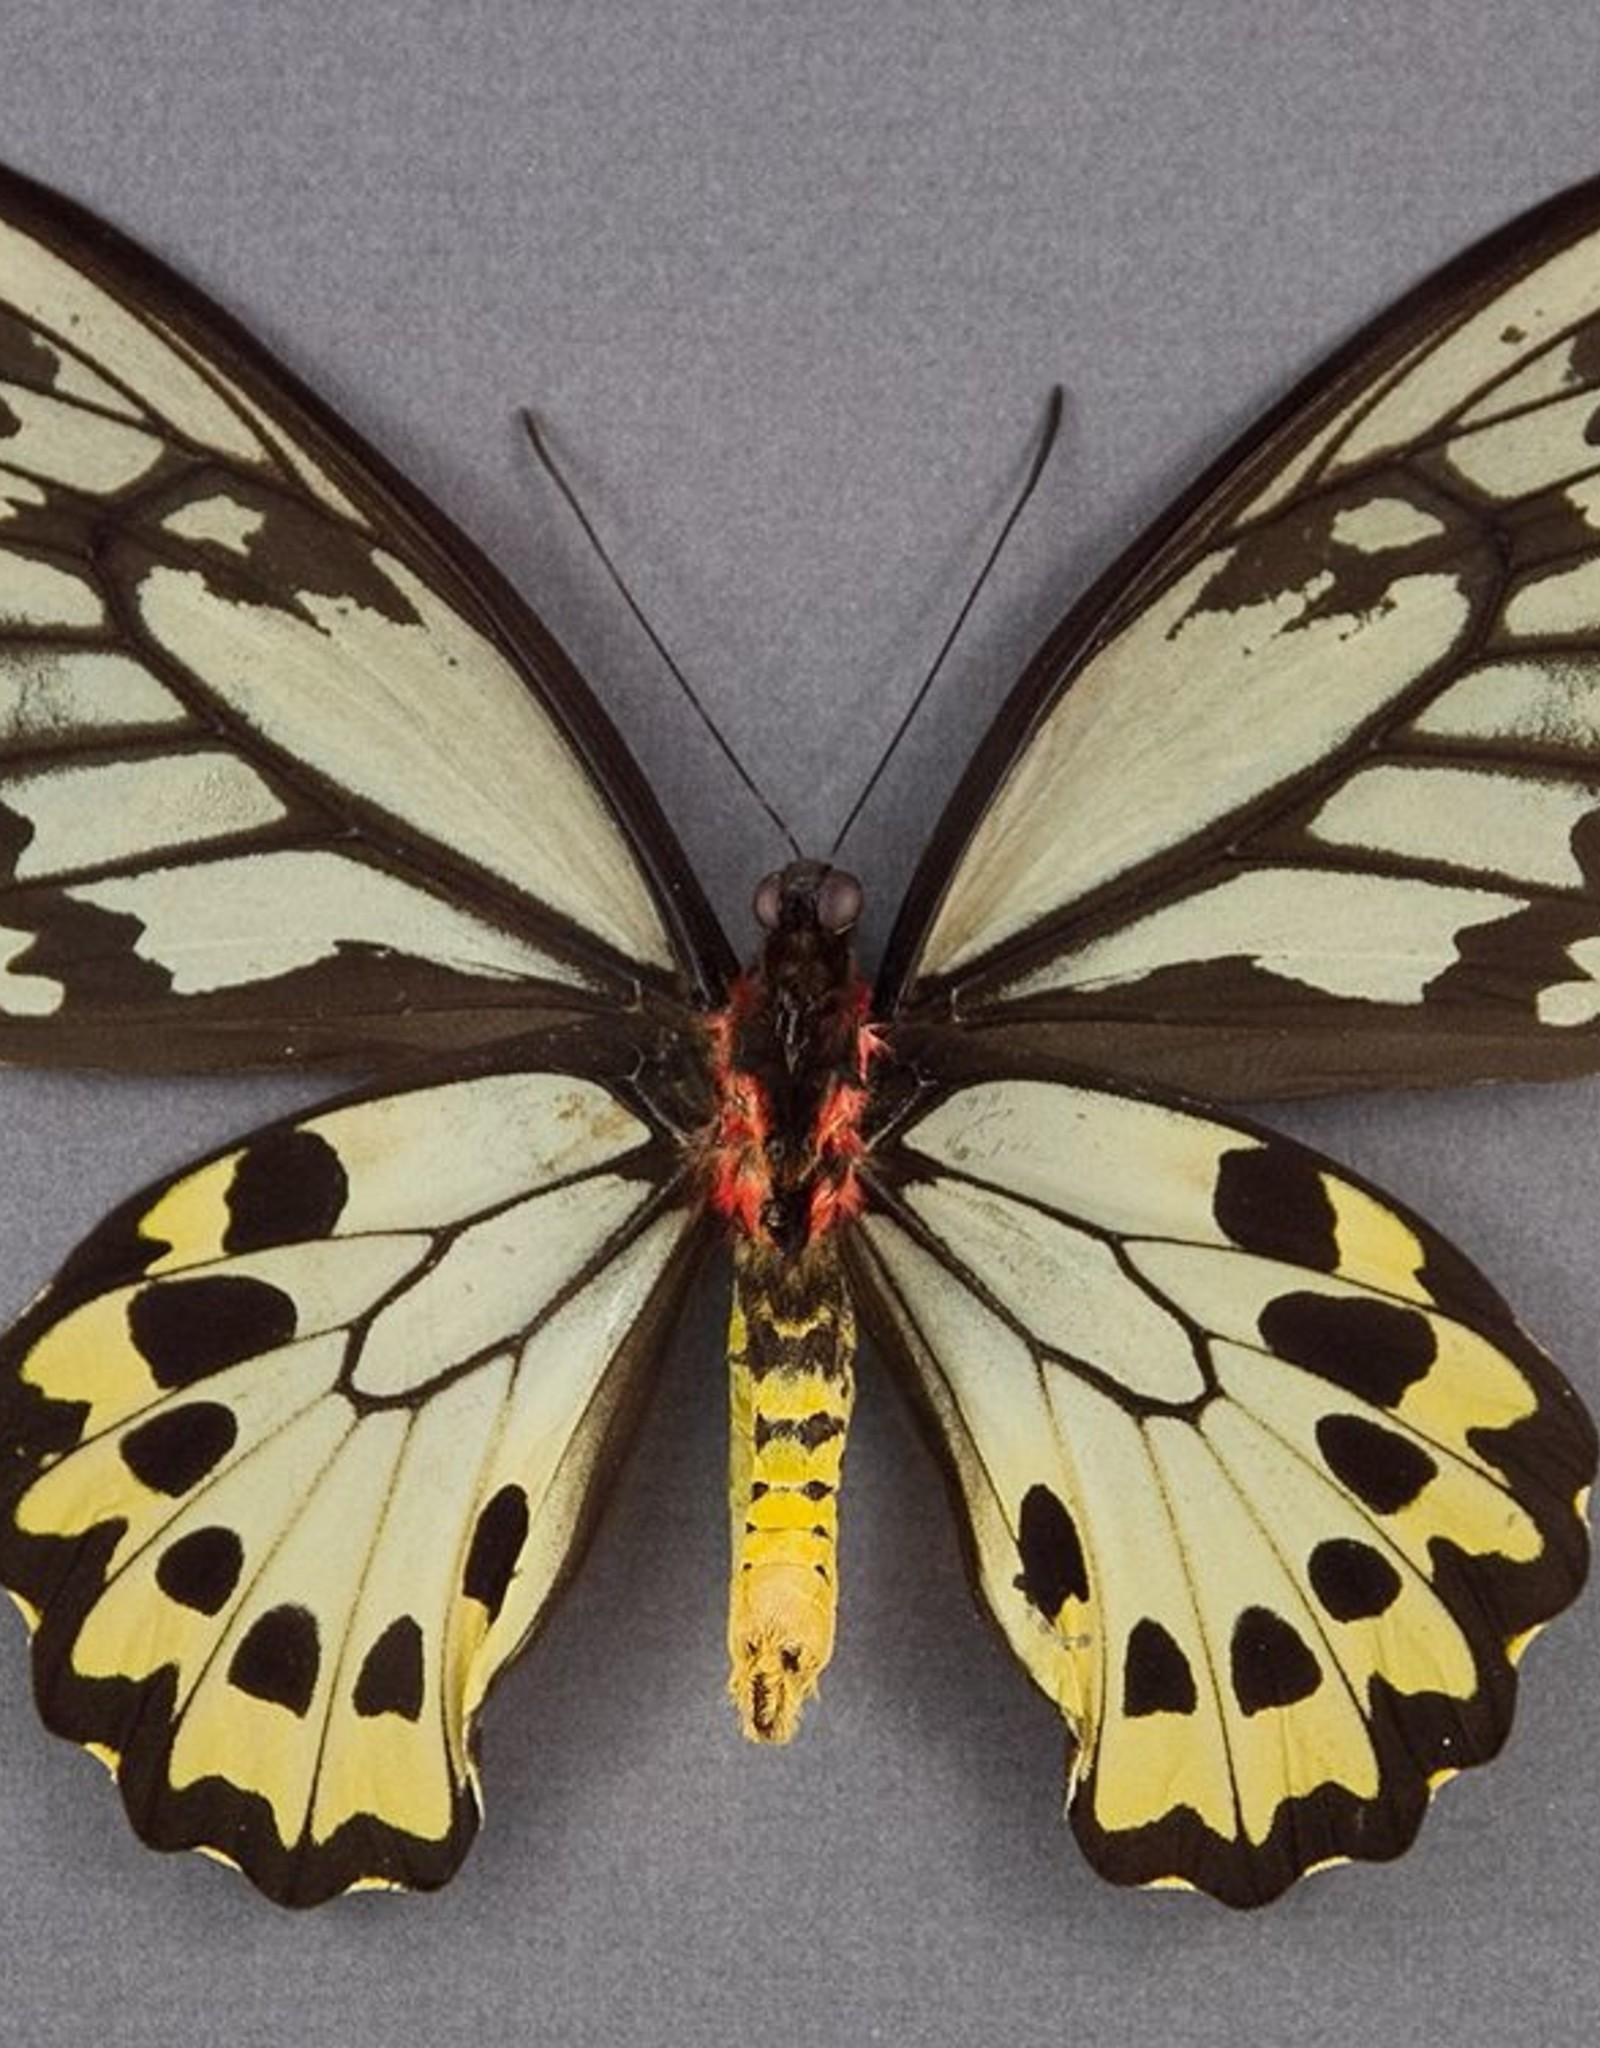 Ornithoptera croesus lydius PAIR A1 Halmahera Island, Indonesia